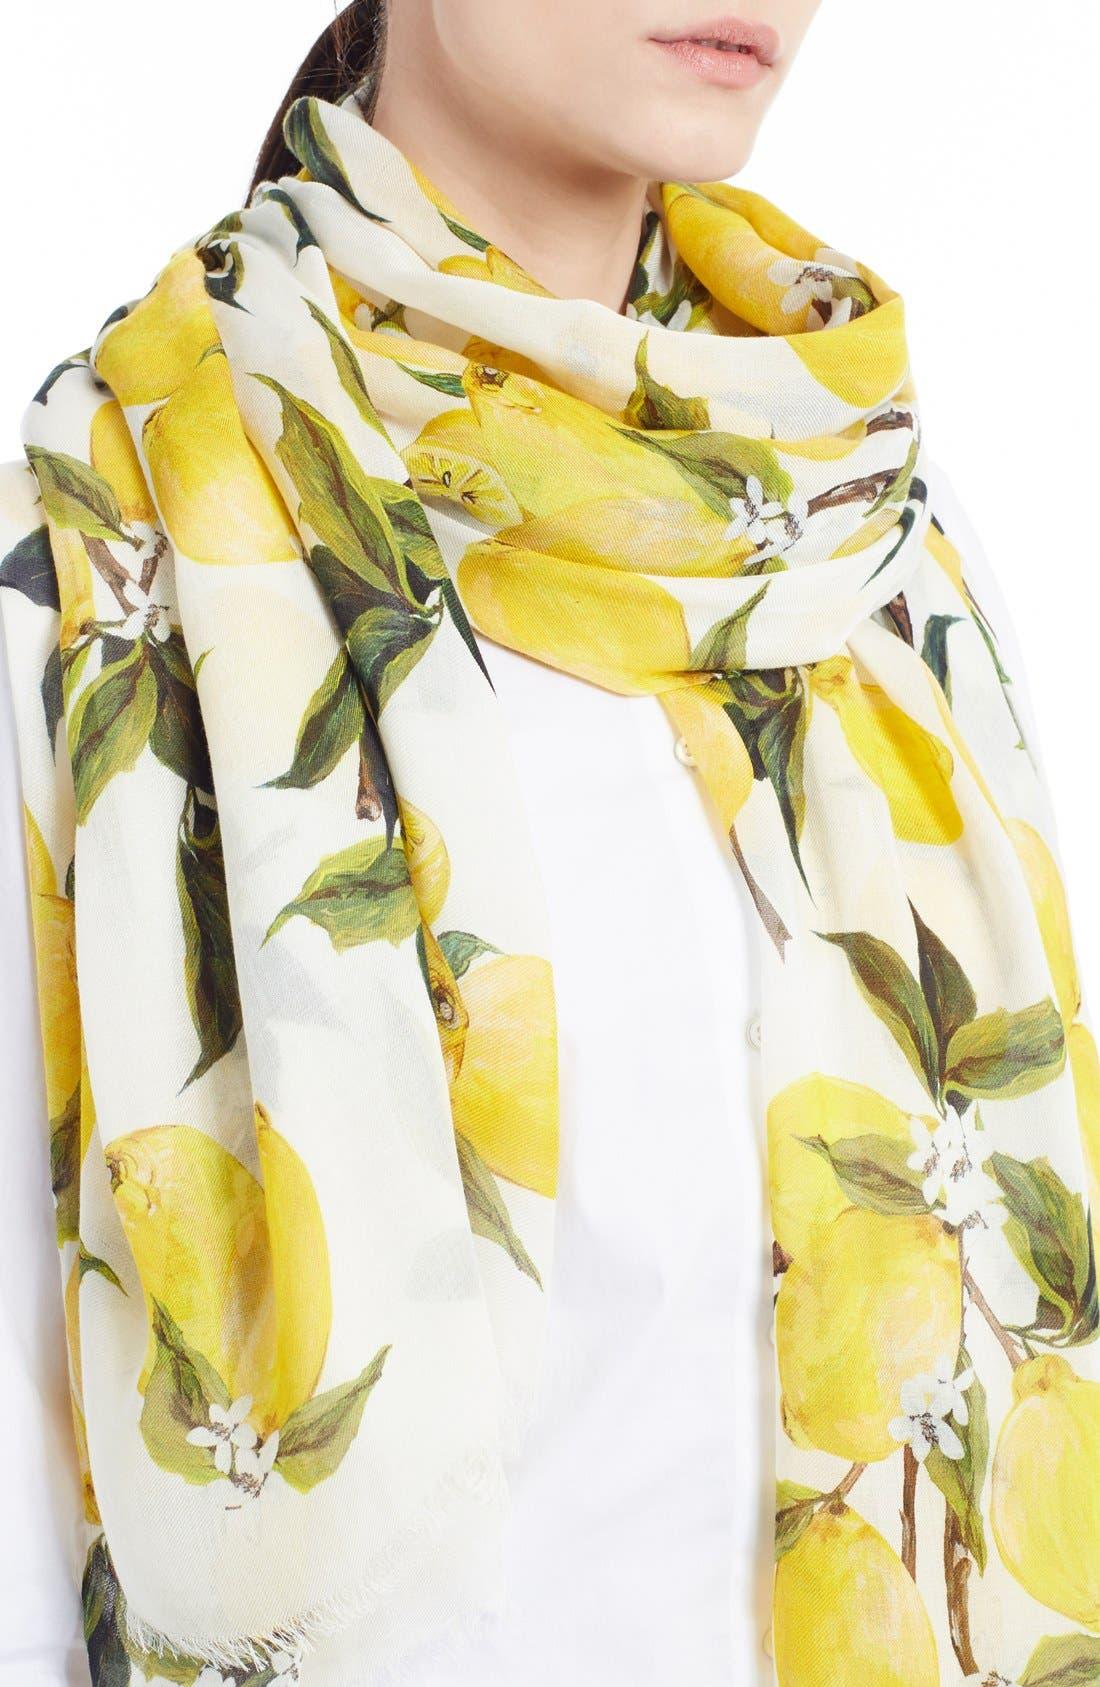 Main Image - Dolce&Gabbana Lemon Print Modal & Cashmere Scarf